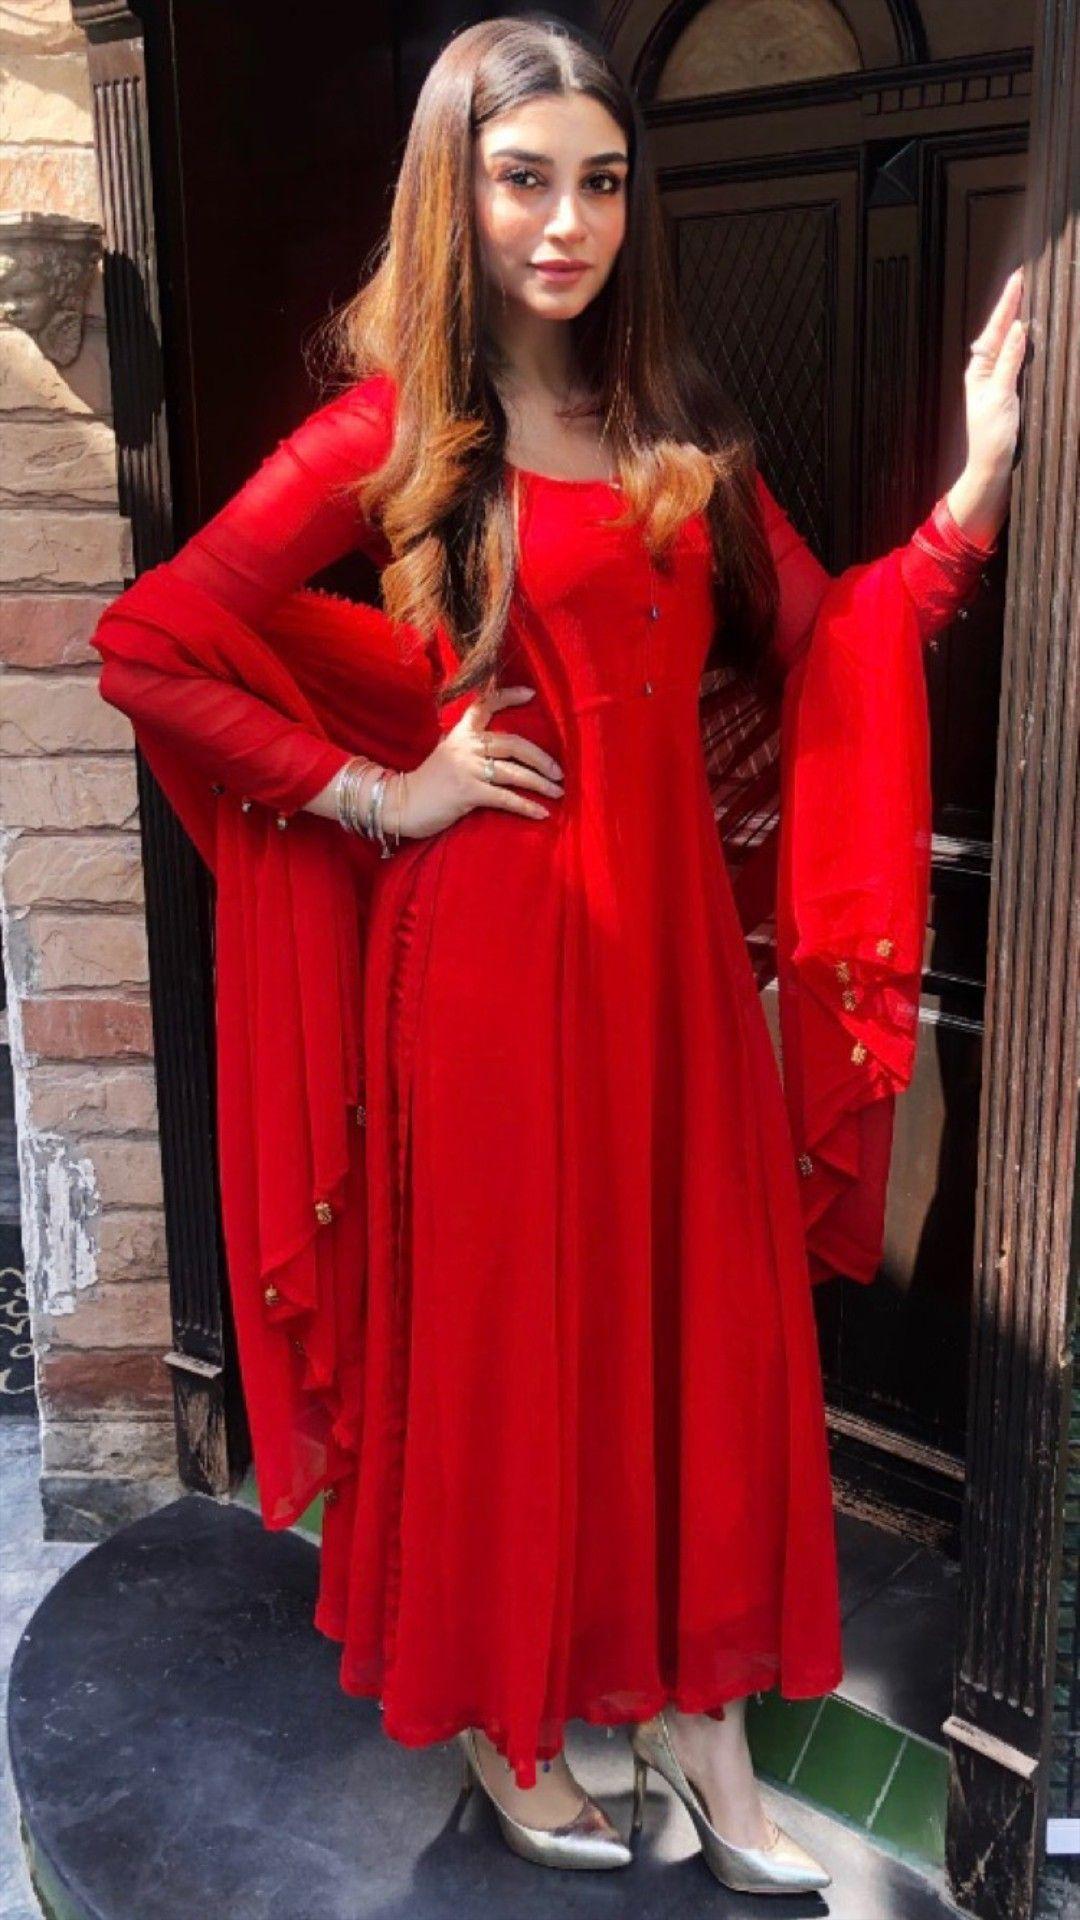 bafba8c696 Pin by 👑mar u.j👑 on Pakistani Celebrities in 2019 | Formal dresses,  Fashion, Girl fashion